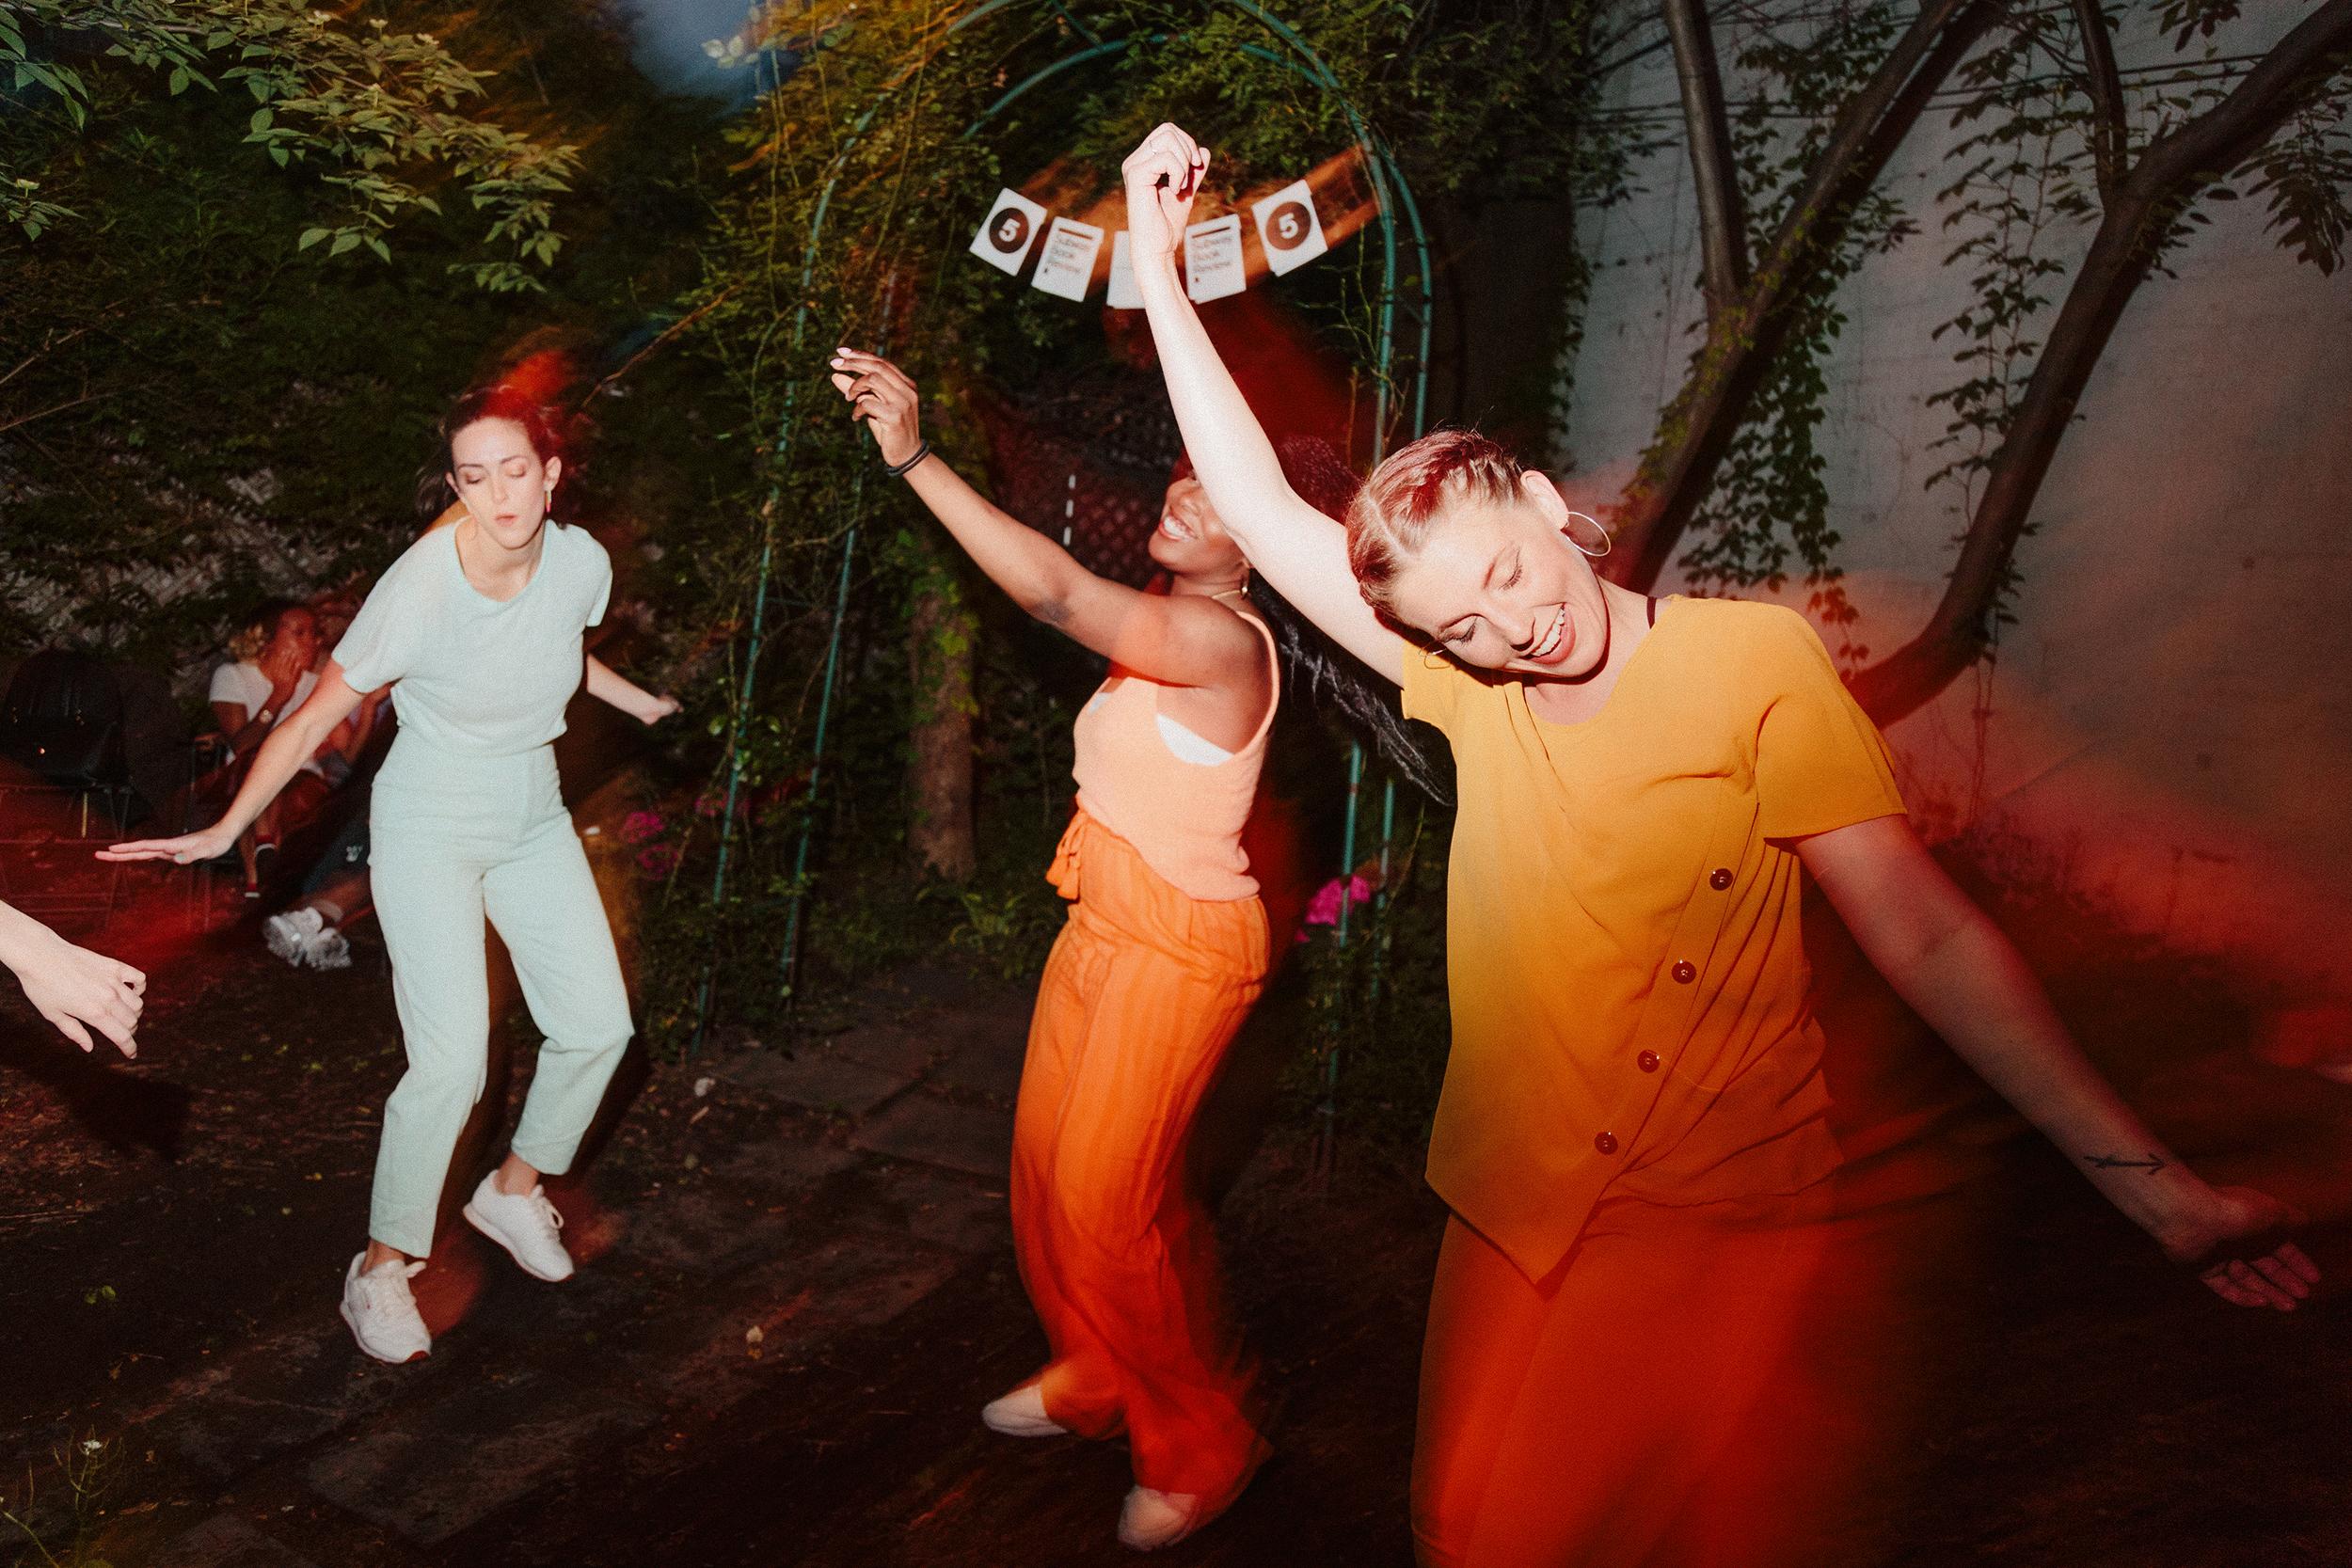 Christina Slāton, Kelsey Grills, & Adrianne Ansley